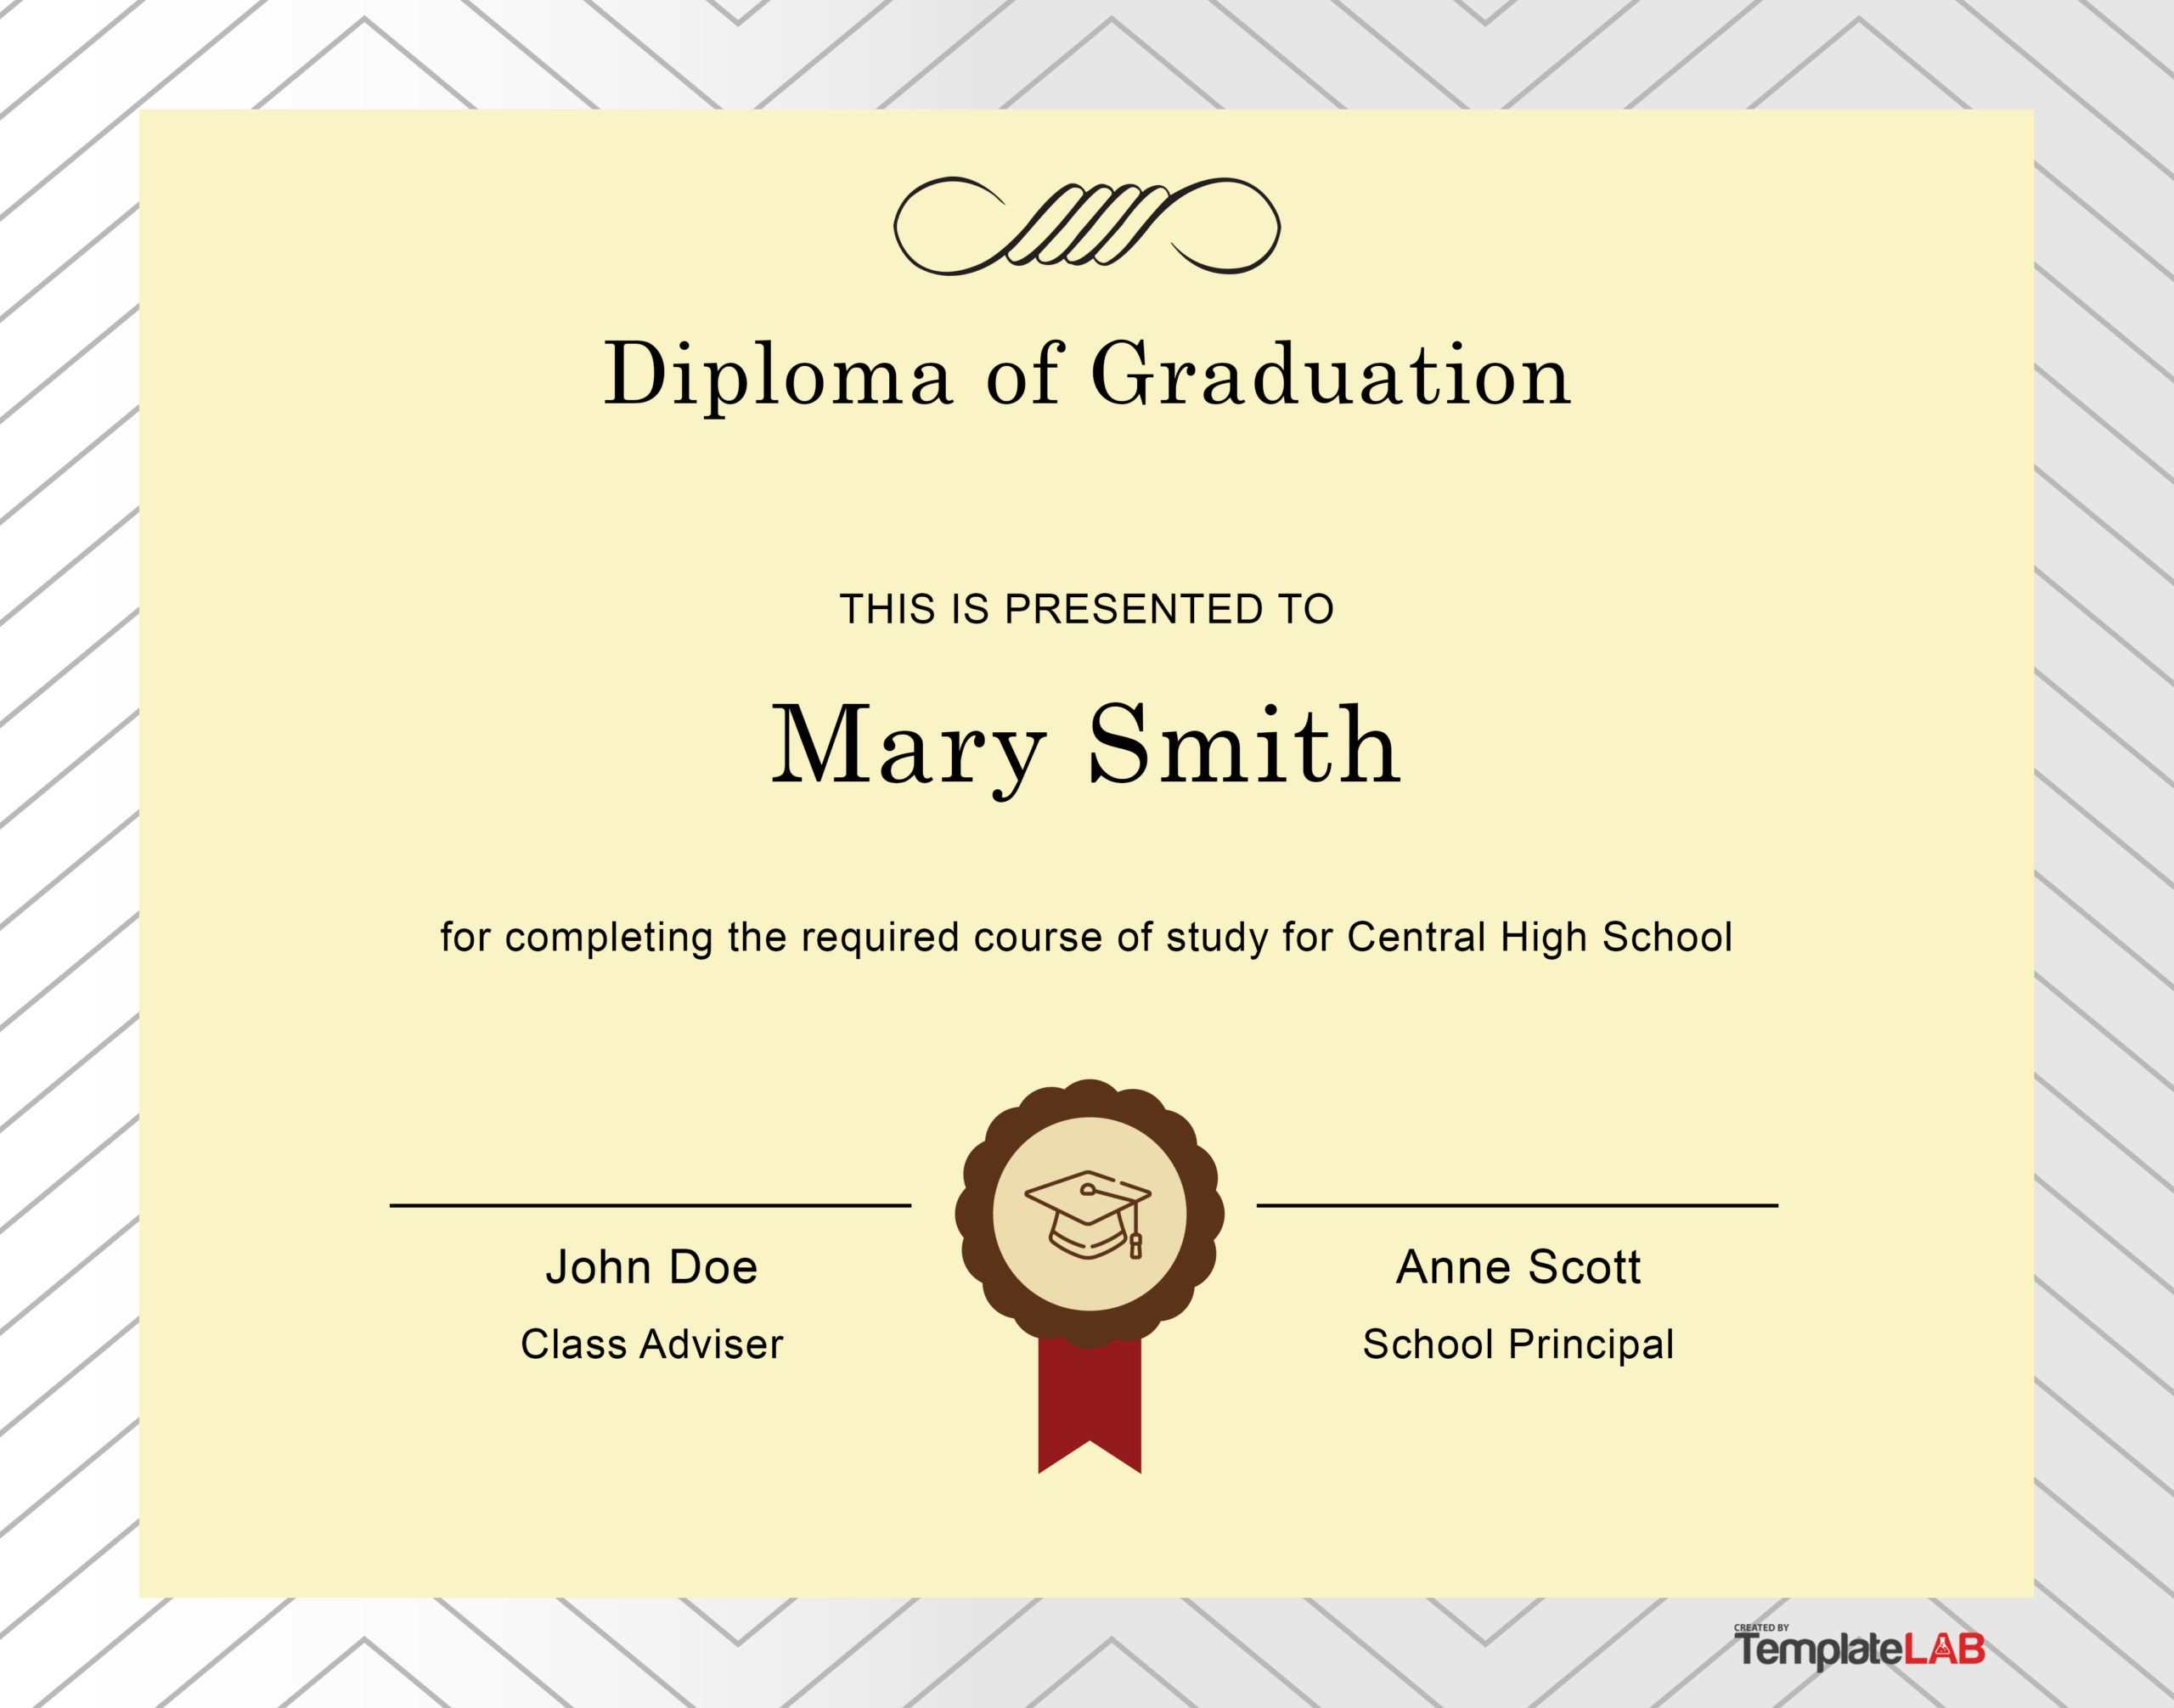 Free Diploma Template 14 - TemplateLab.com